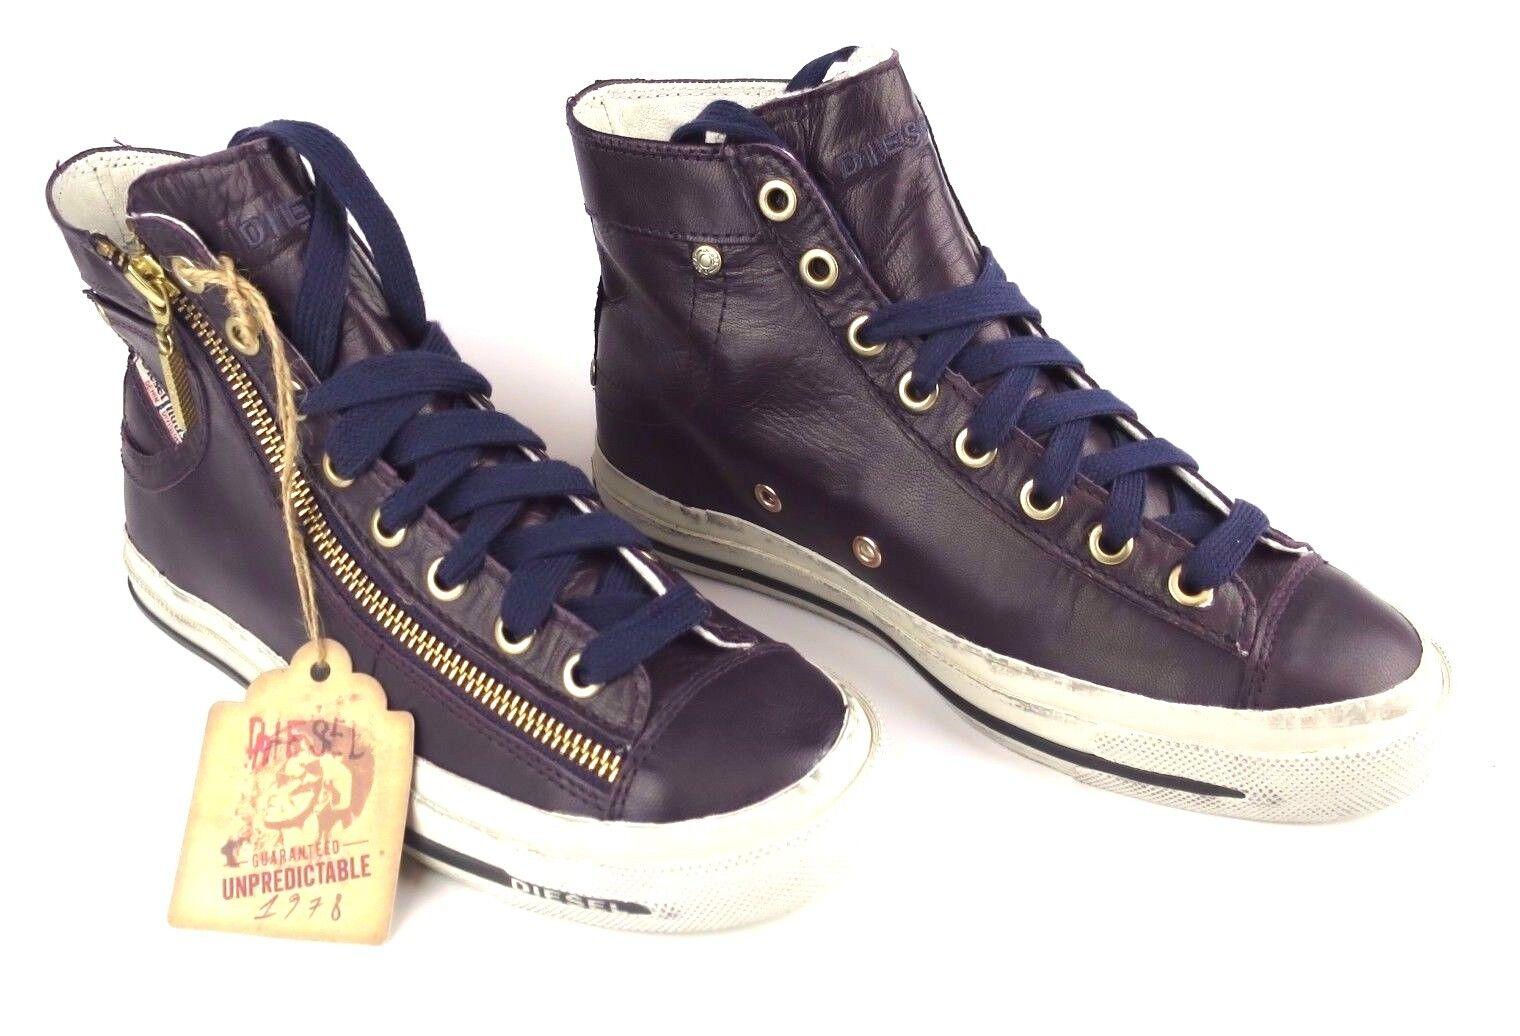 DIESEL scarpe da ginnastica MAGNETI Expo-Zip Expo-Zip MAGNETI da Donna Designer Scarpe Woman Shoes d1 6e0193